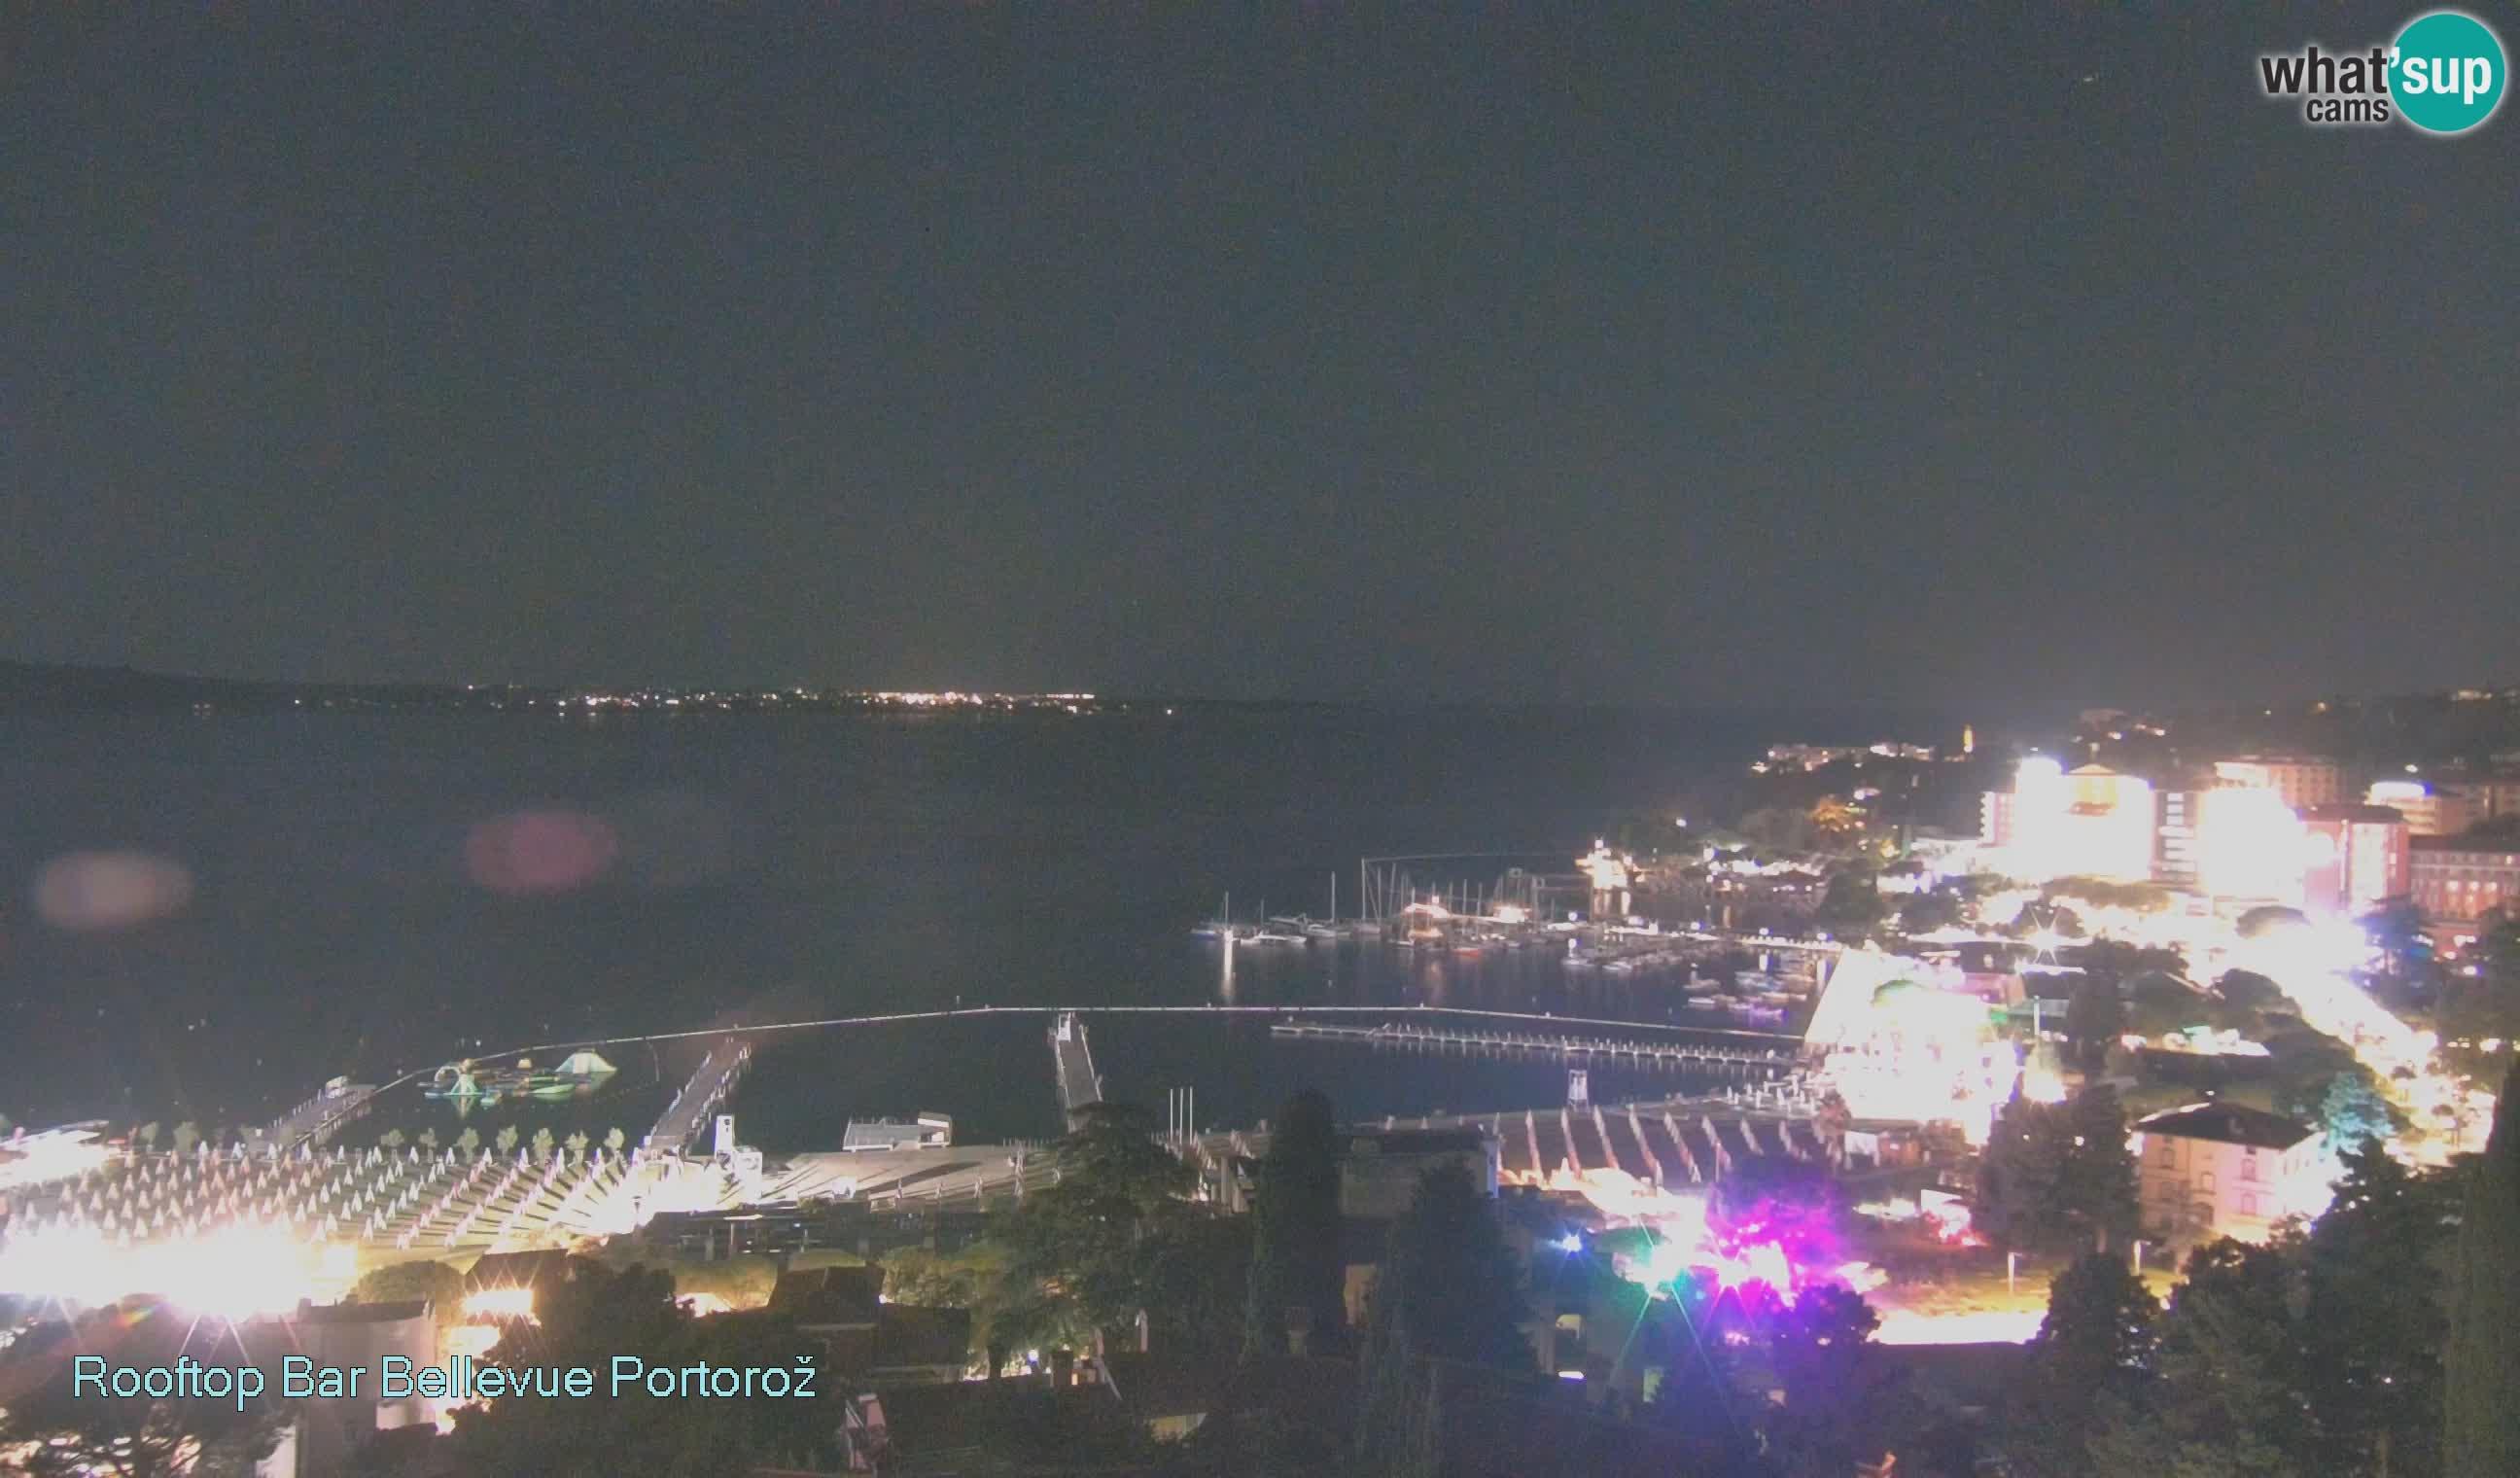 Portorož Sun. 23:35